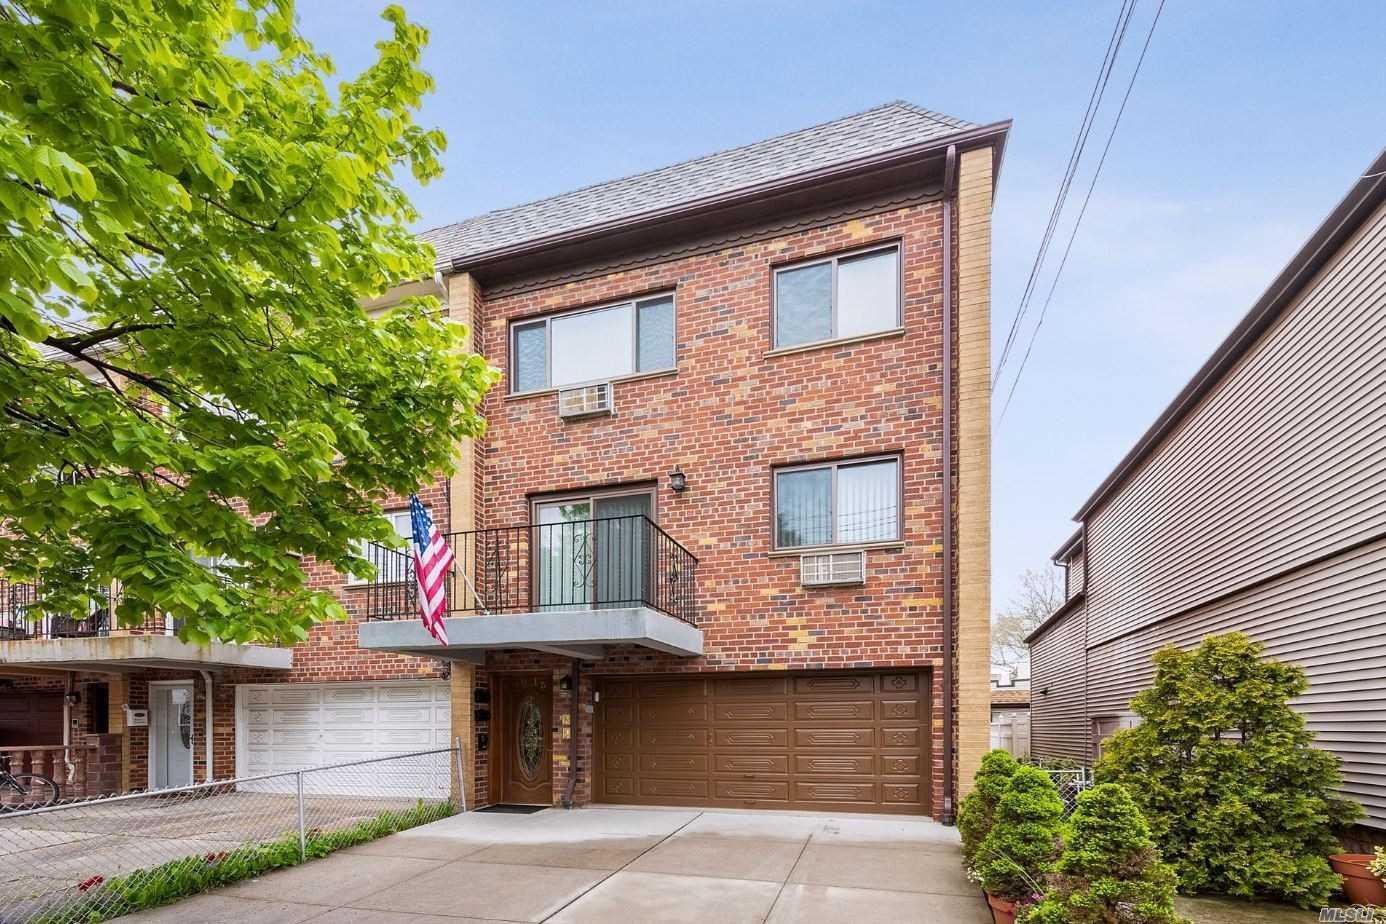 Property for sale at 70-15 71st Place, Glendale NY 11385, Glendale,  New York 11385